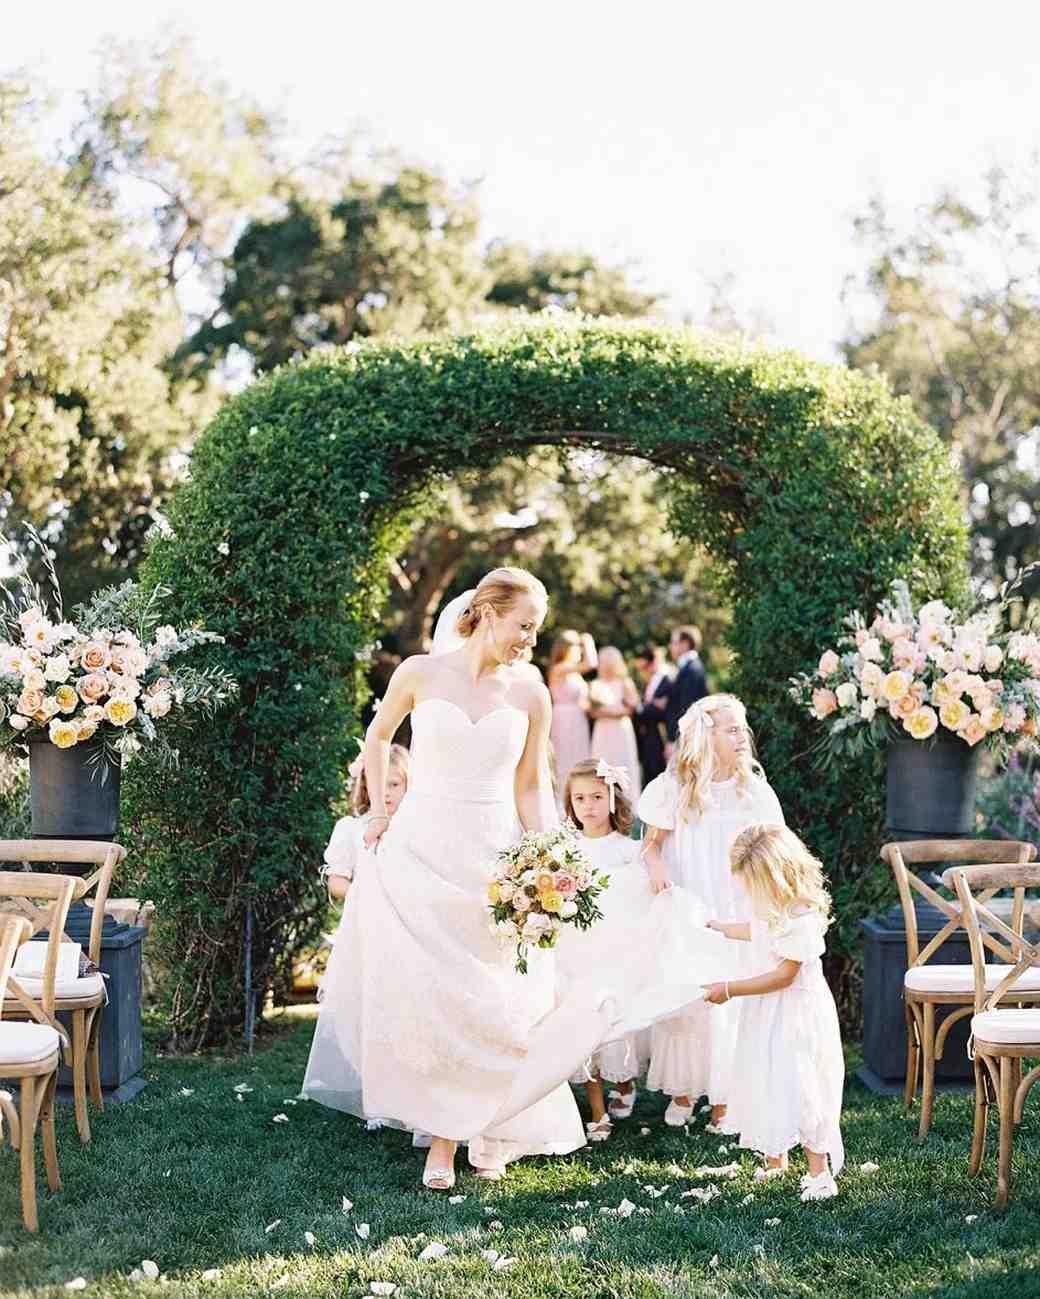 bridal-party-candids-9-0416.jpg